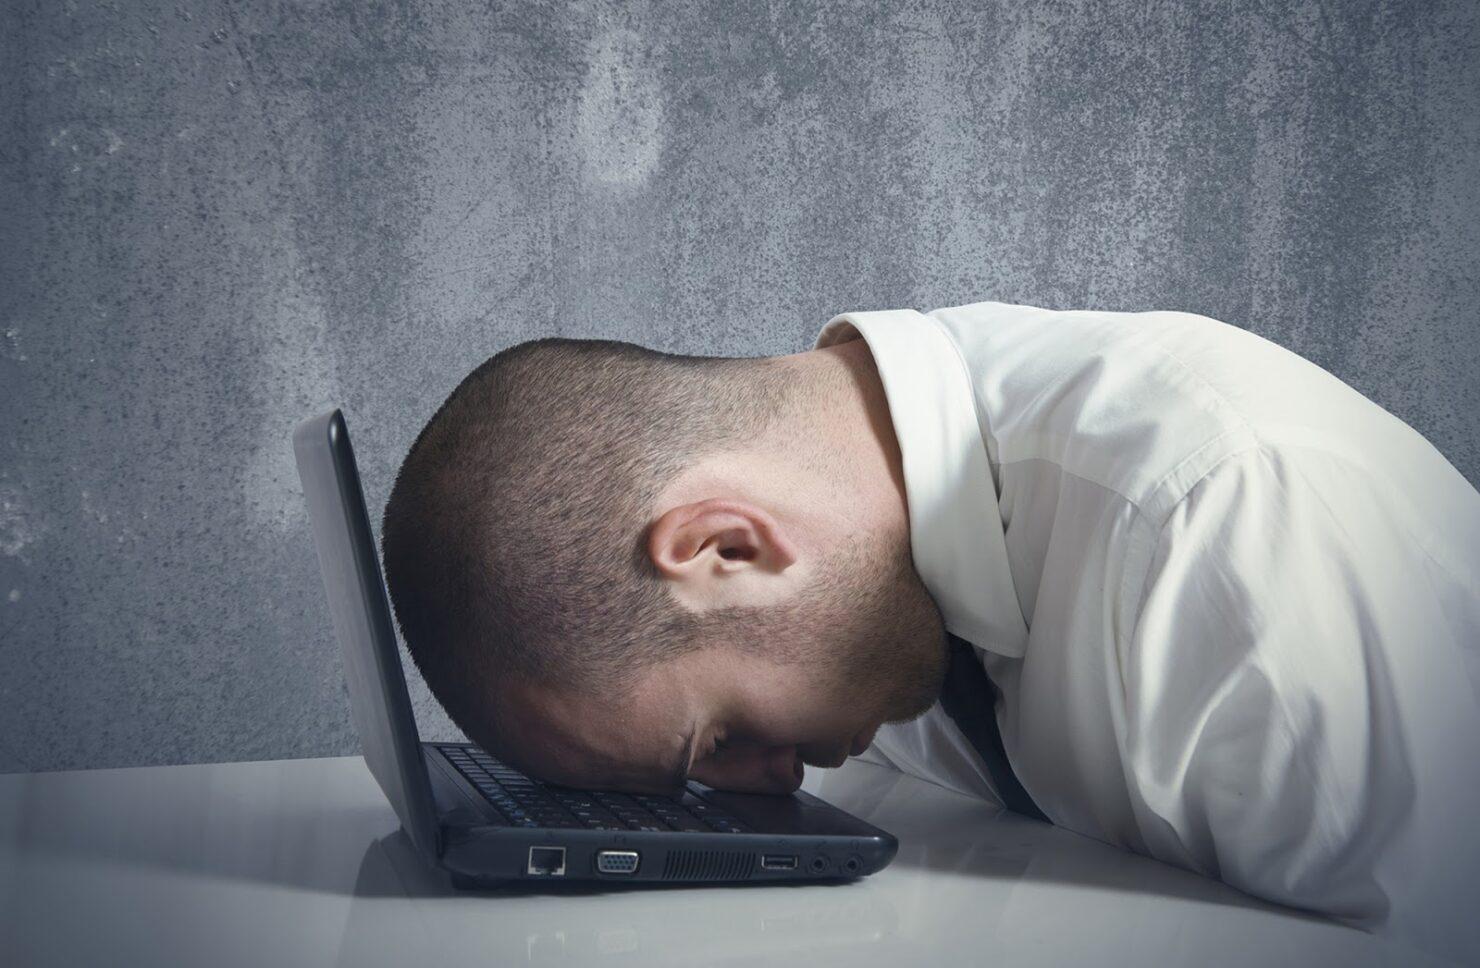 dark web equifax phishing DISASTER